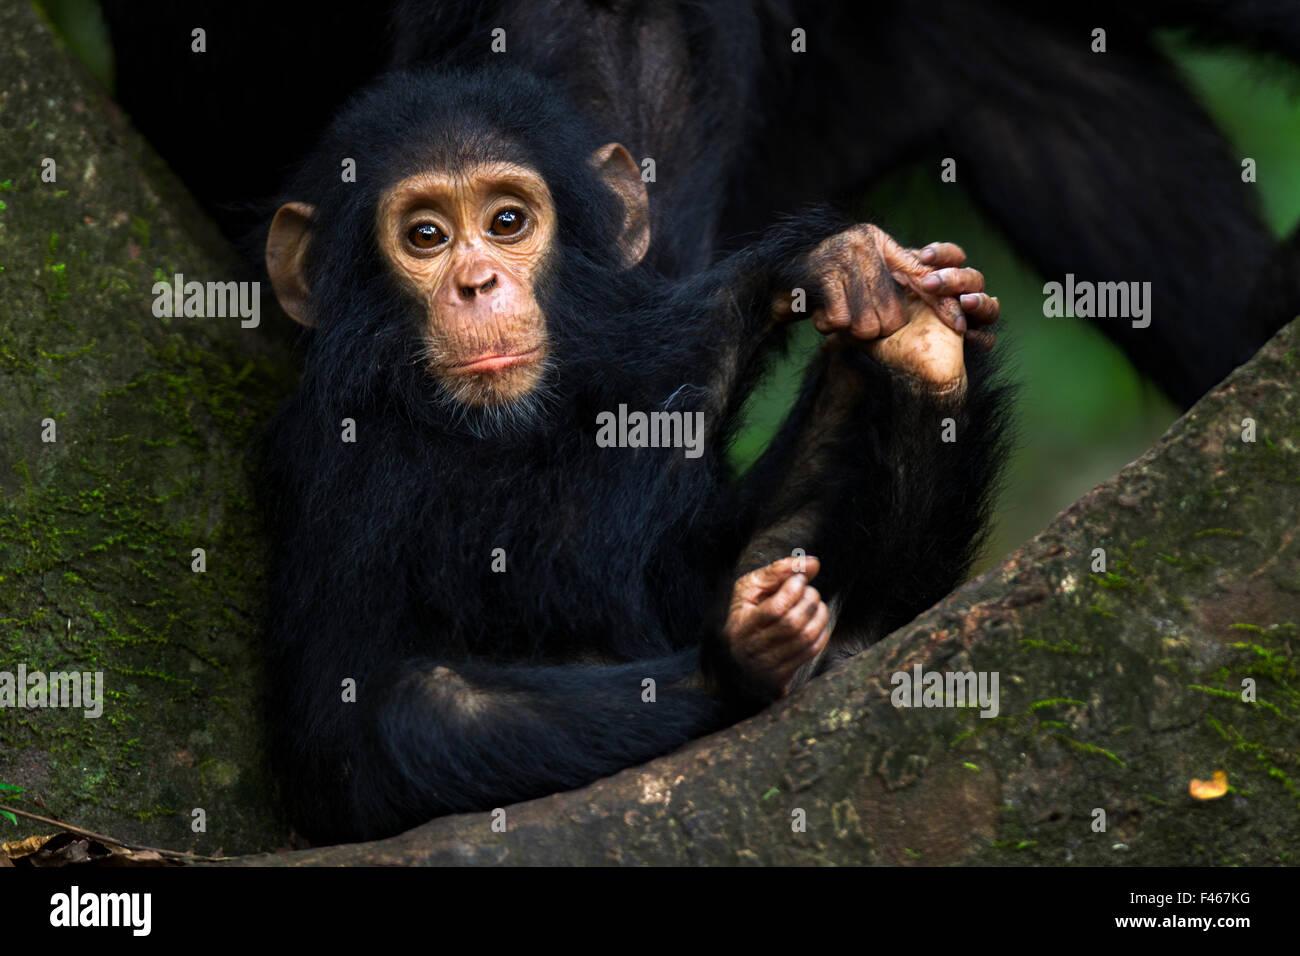 Eastern chimpanzee (Pan troglodytes schweinfurtheii) infant male 'Gizmo' aged 1-2 years sitting portrait. - Stock Image